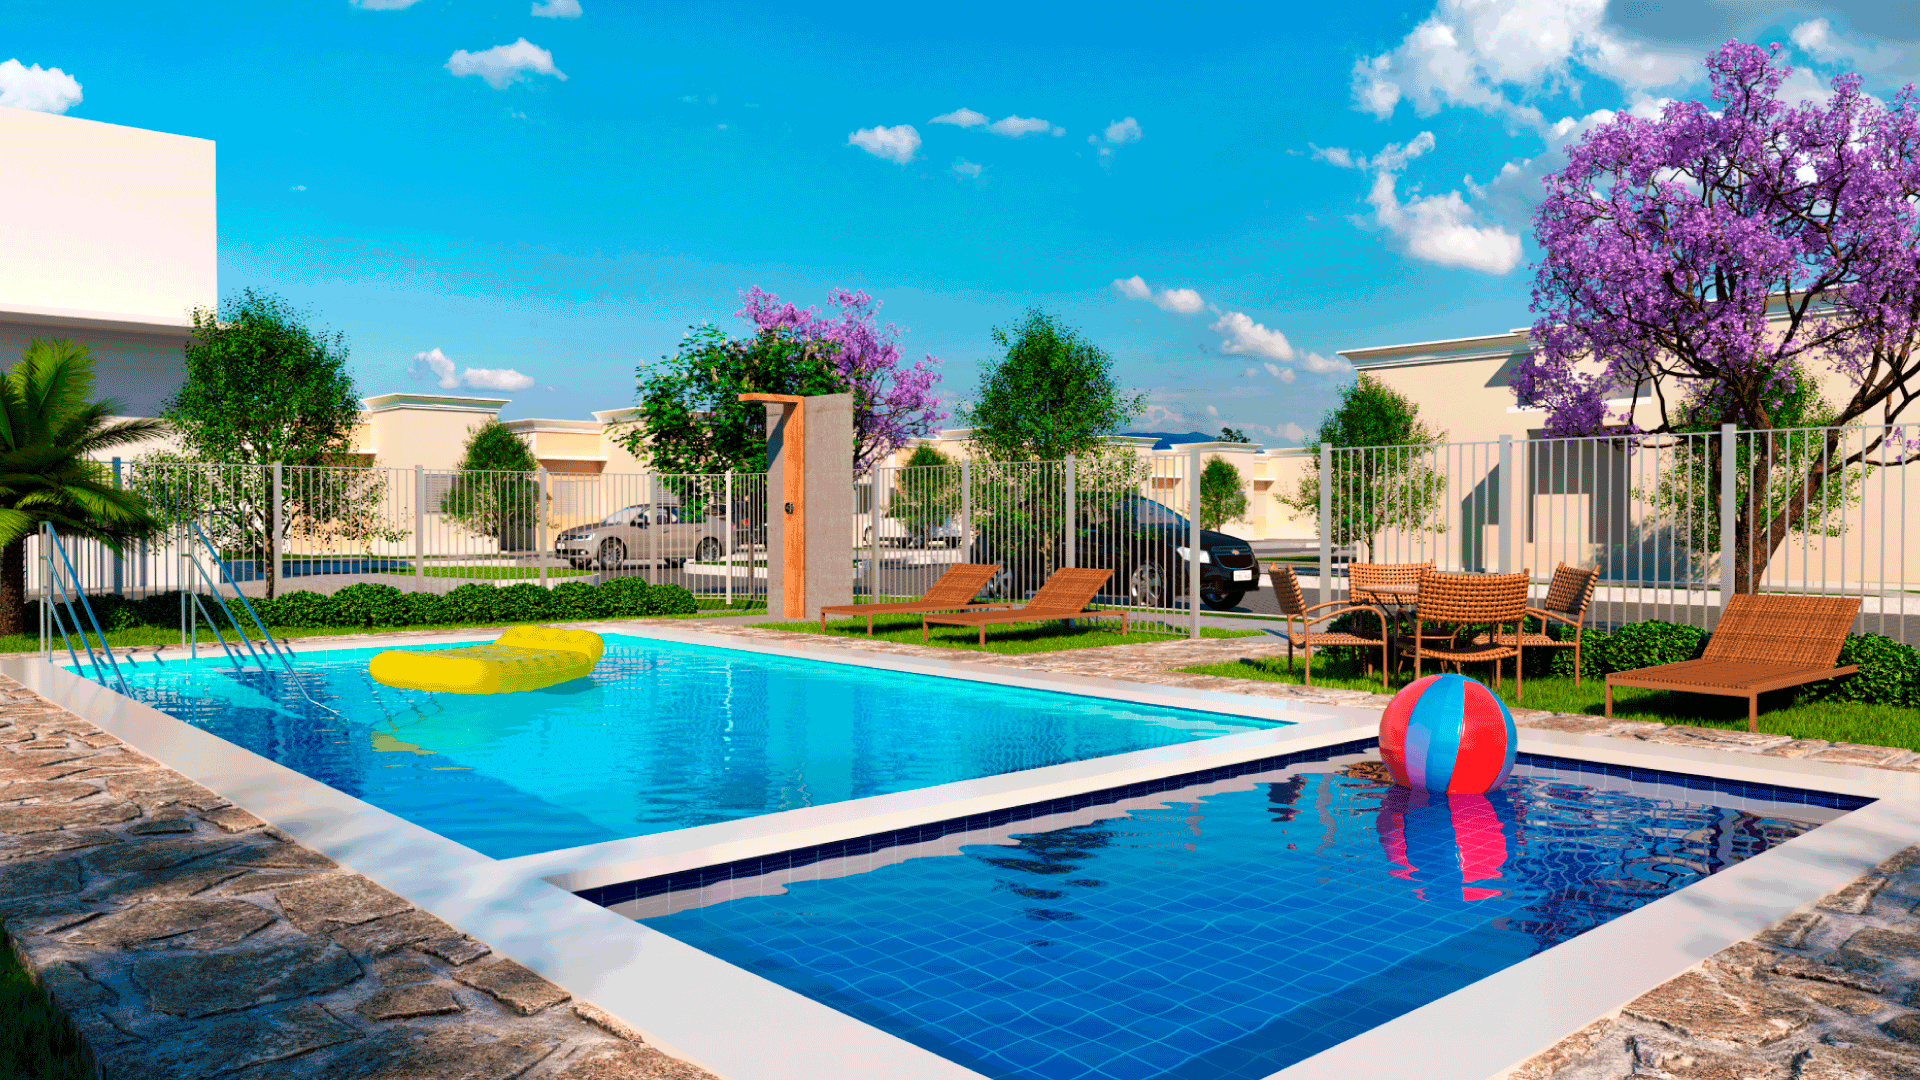 piscina adulto e infantil